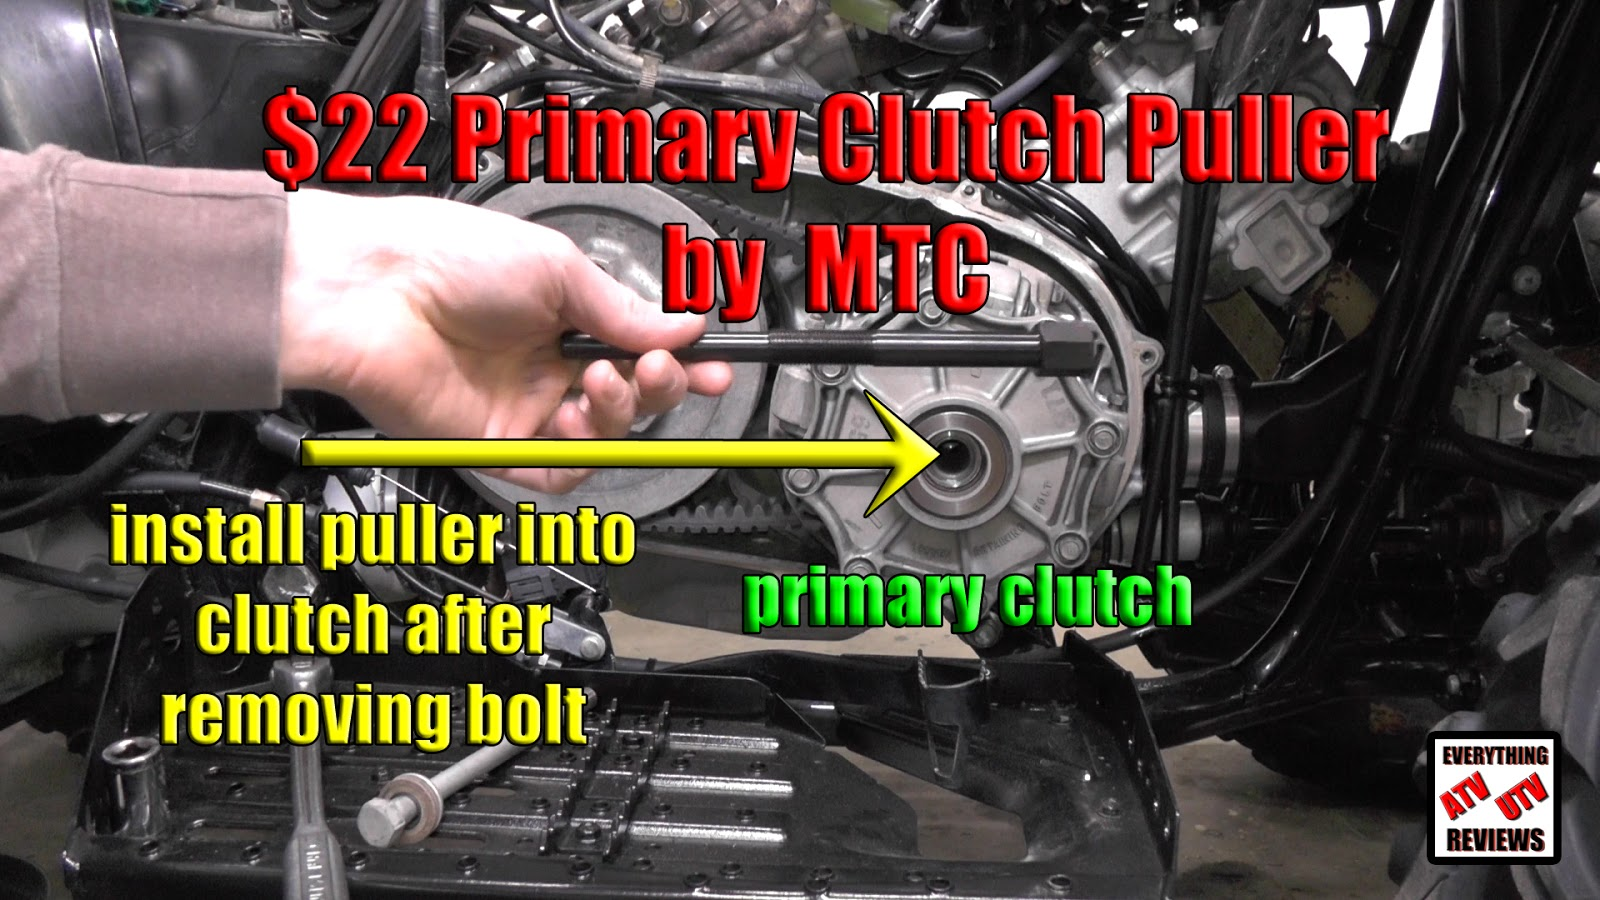 EVERYTHING ATV UTV REVIEWS: Primary Clutch Puller Tool to